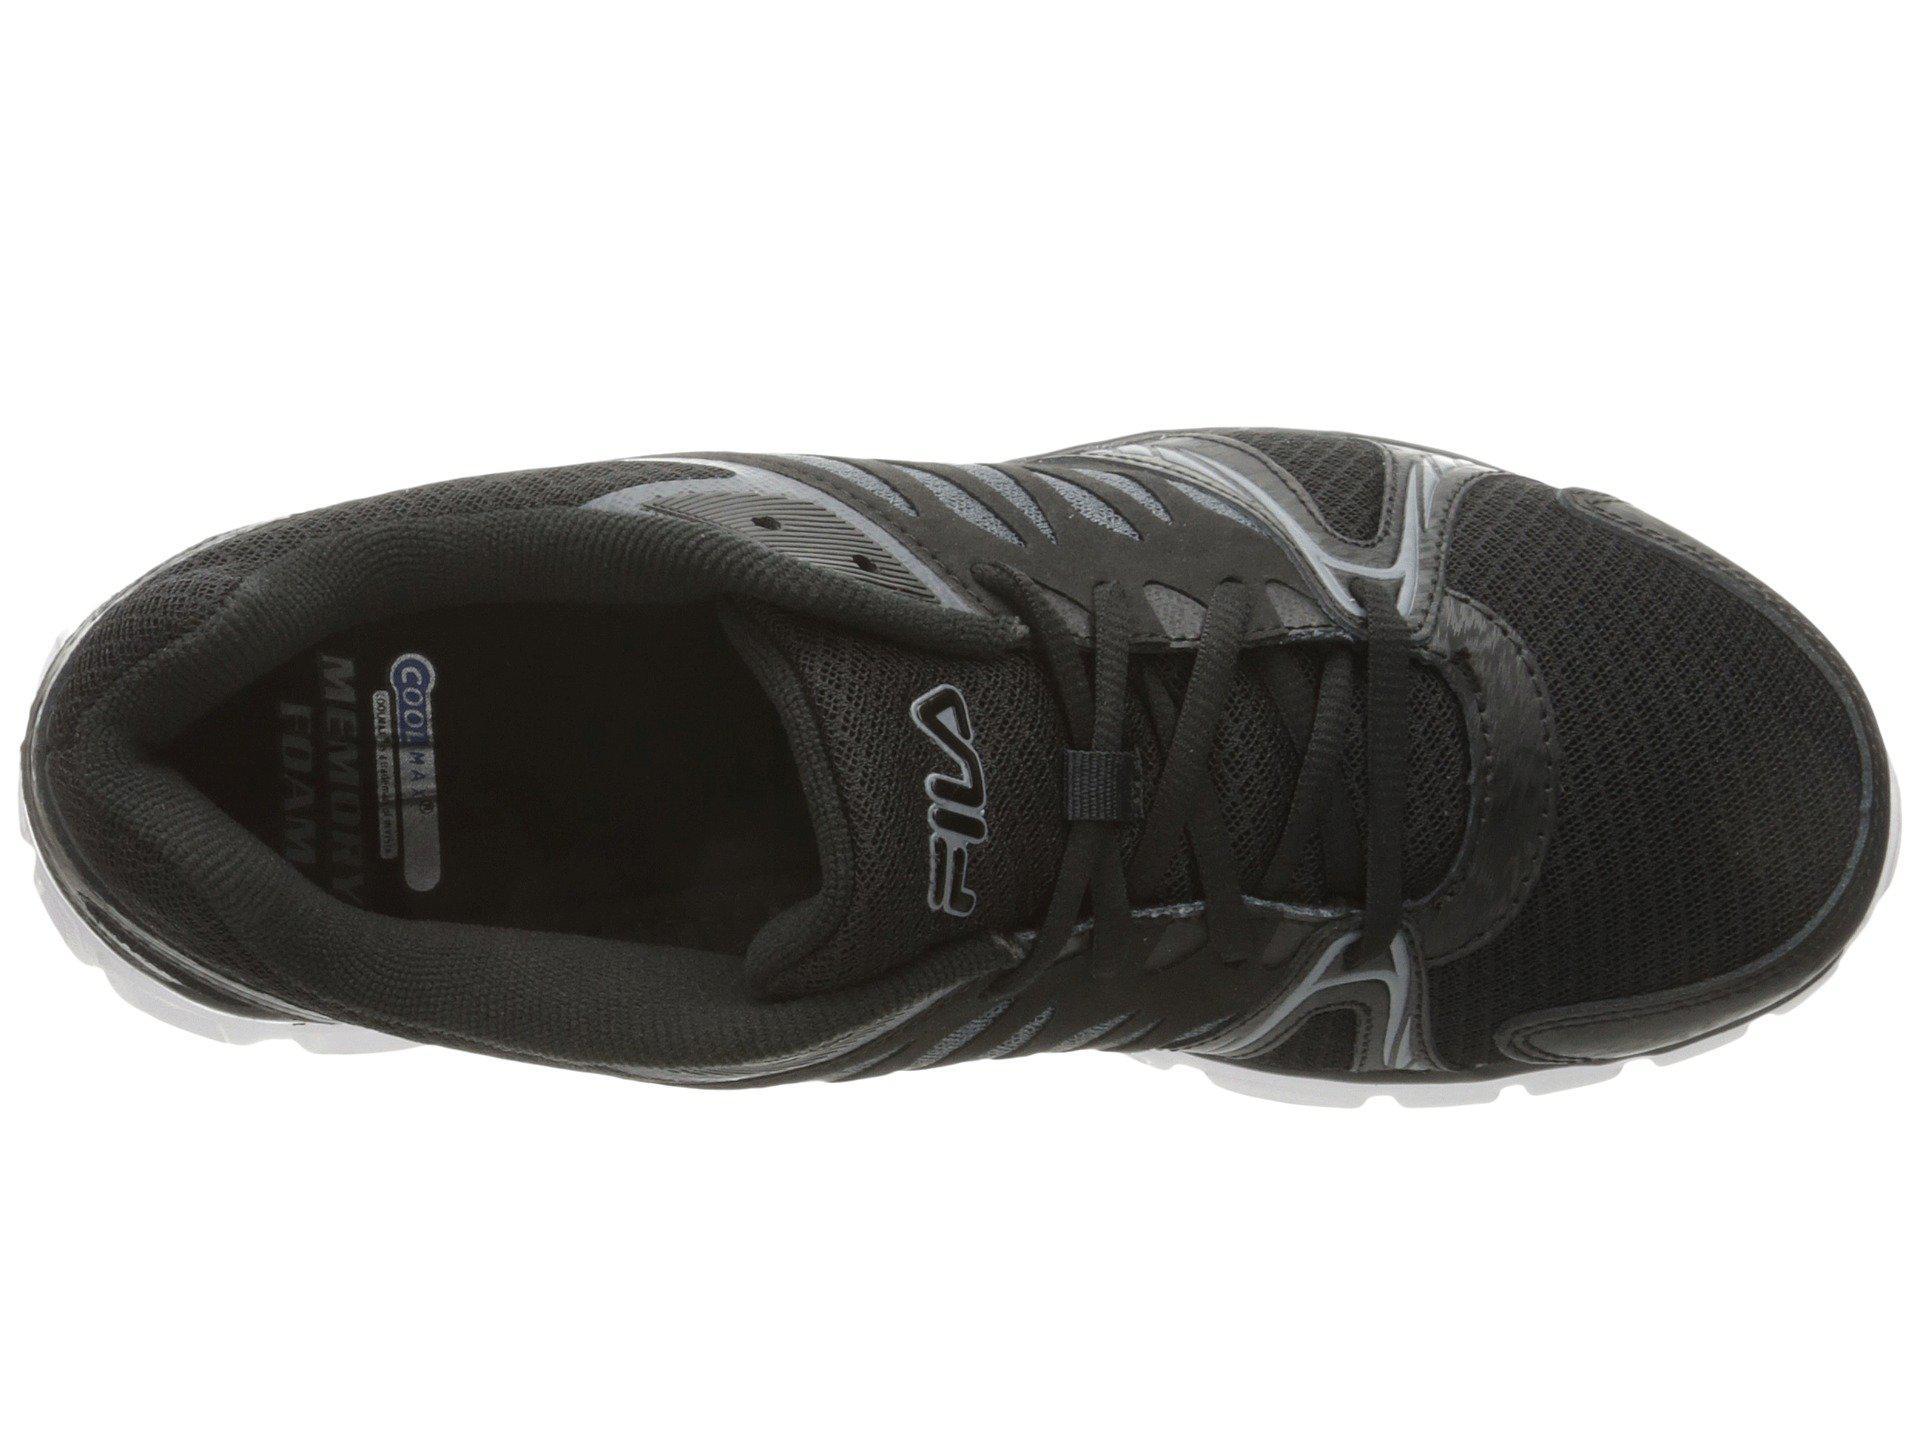 545cfd9a528d Lyst - Fila Memory Sendoff Cross-trainer Shoe in Black for Men